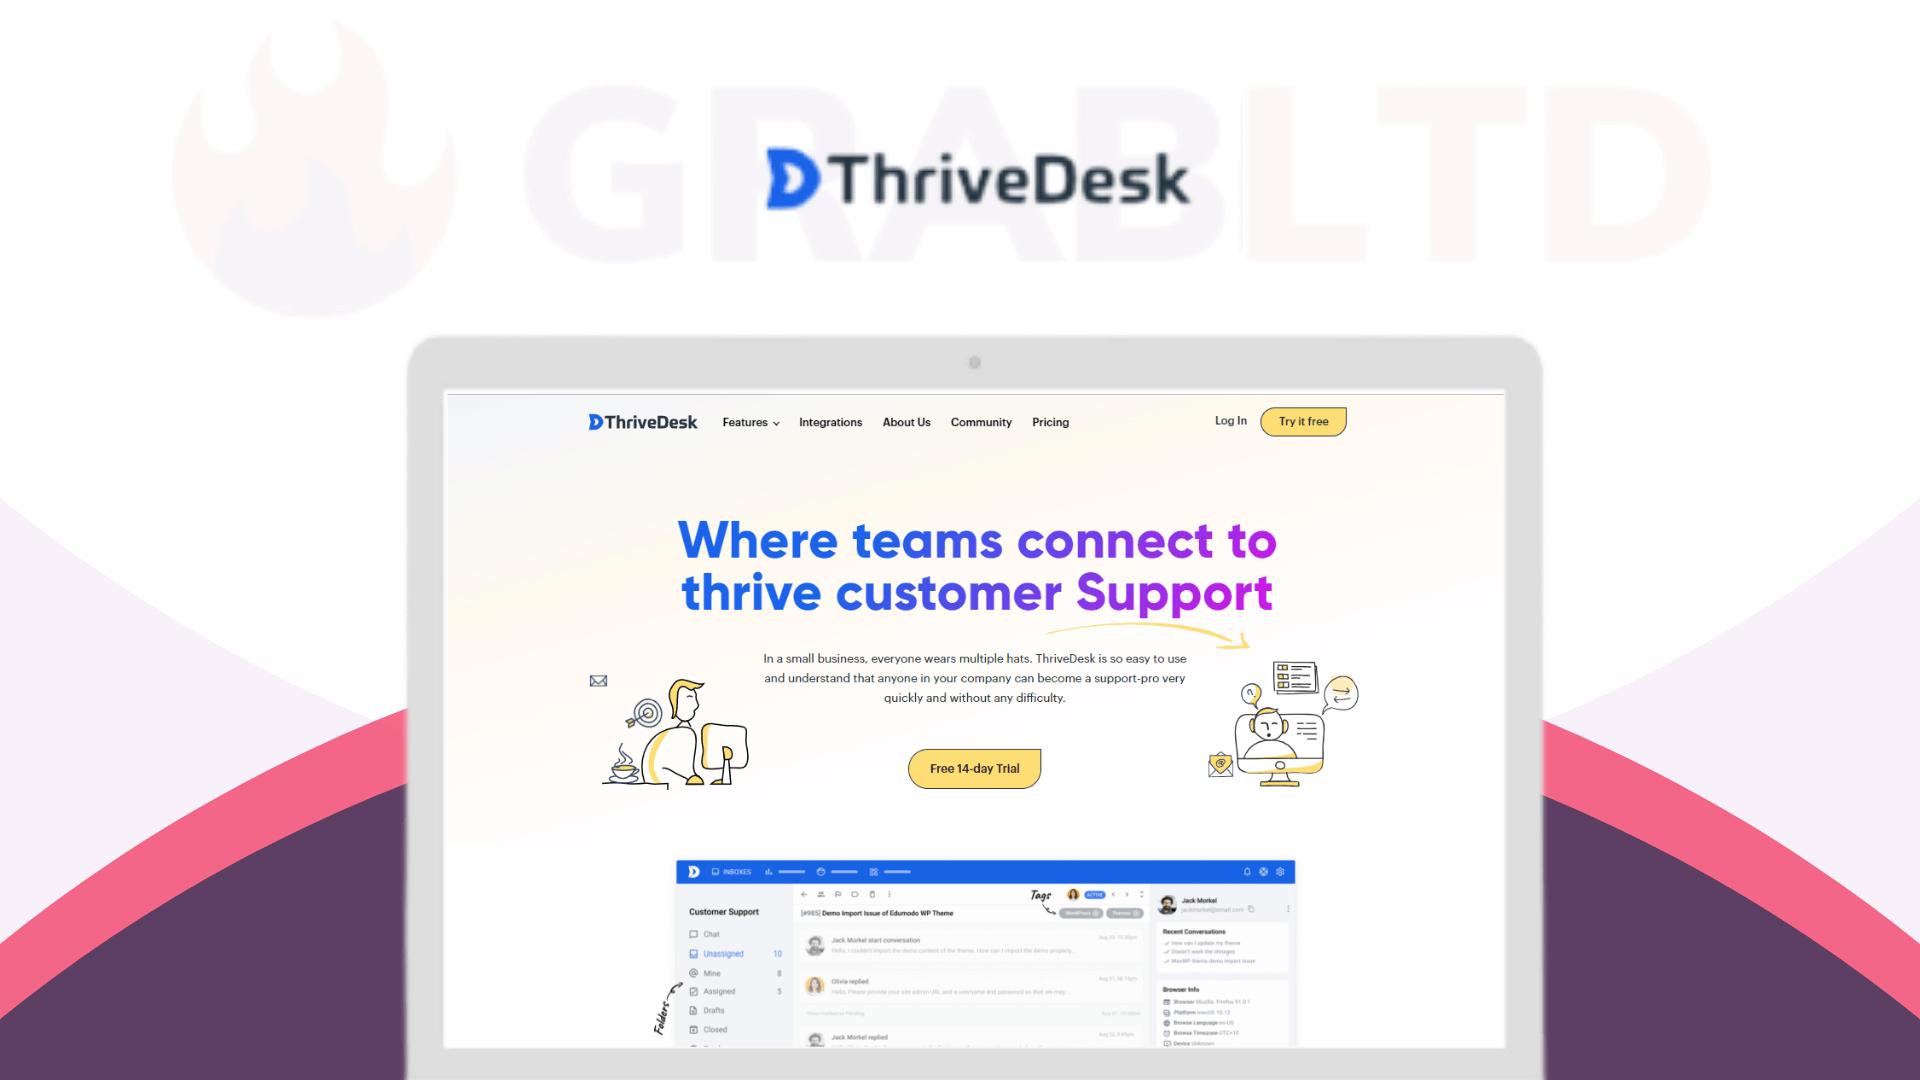 ThriveDesk | Helping Startups Thriving Customer Support 1